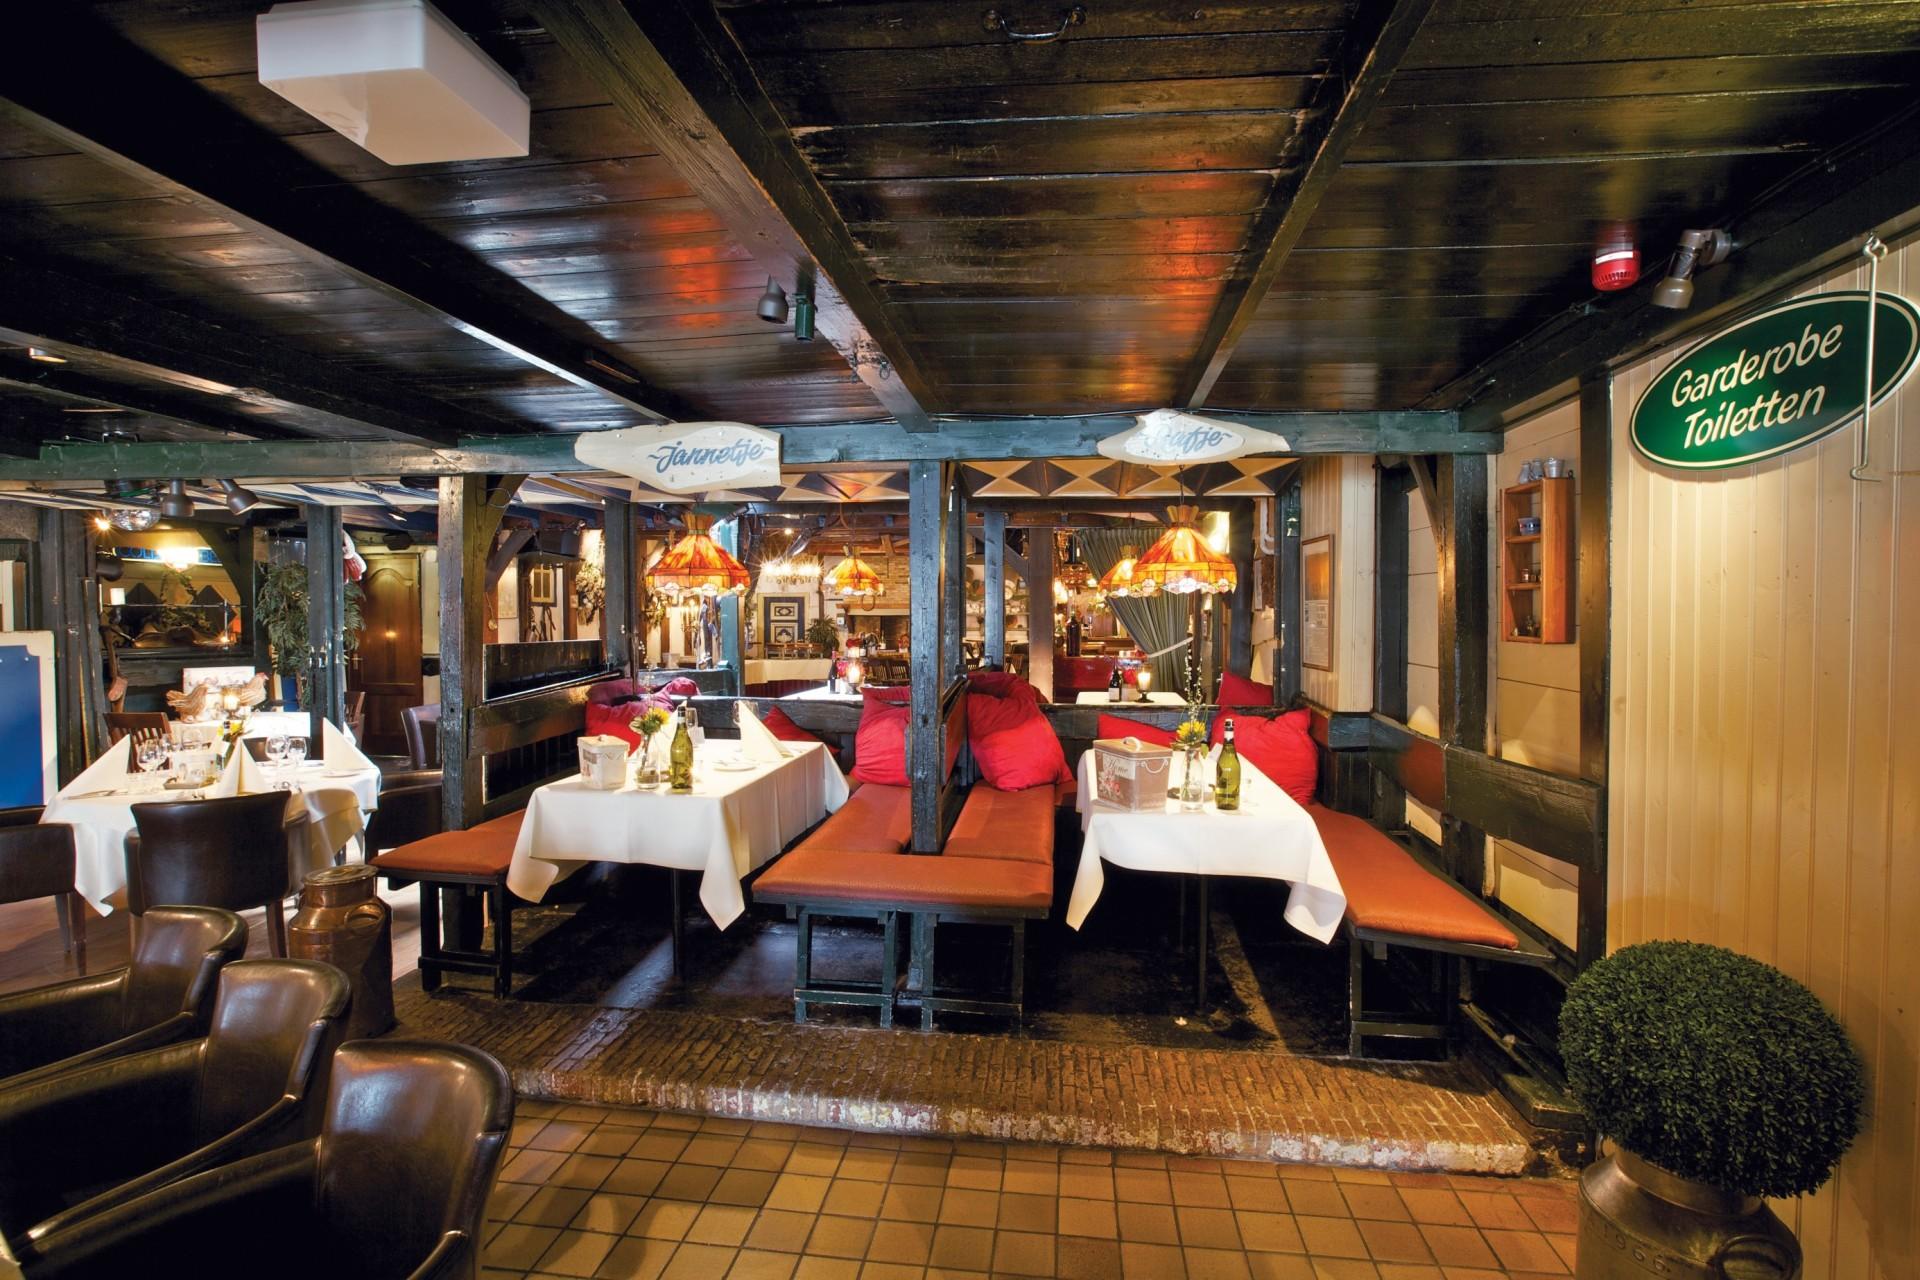 Nadorst-restaurant-uitspanning-faciliteiten-zalen-oude-boerderij-2